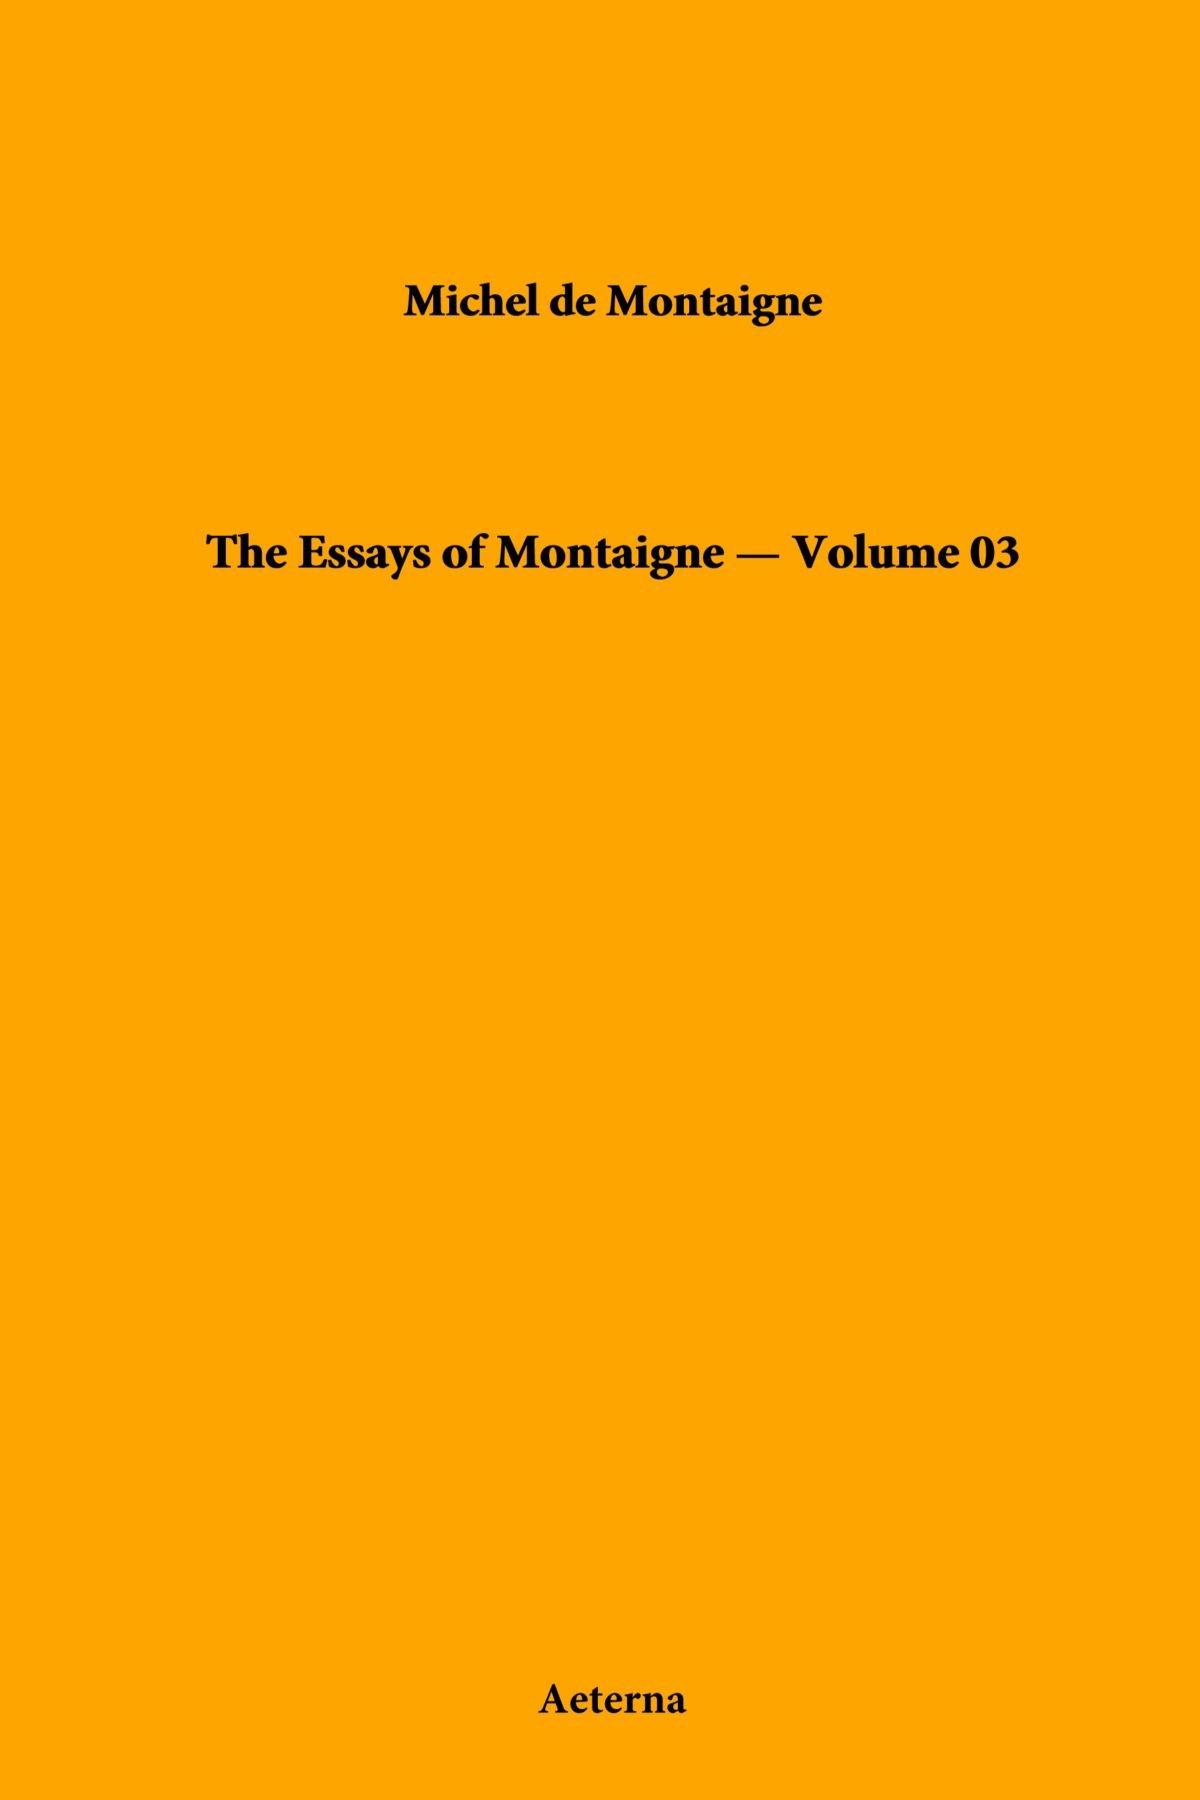 Download The Essays of Montaigne - Volume 03 PDF